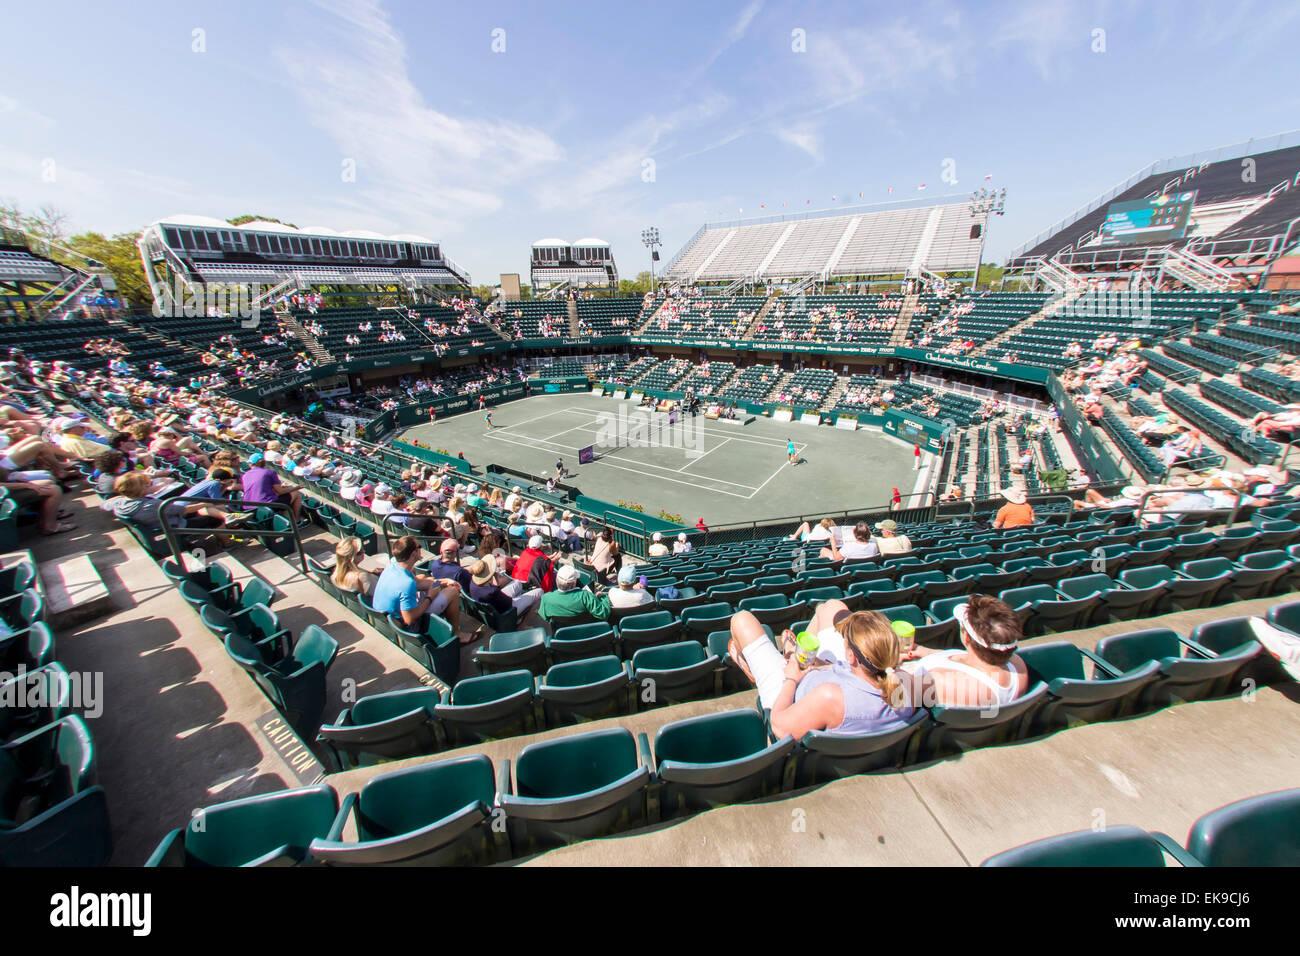 Charleston, SC, USA. 8th Apr, 2015. Charleston, SC - Apr 08, 2015: The Family Circle Tennis Center plays host to Stock Photo